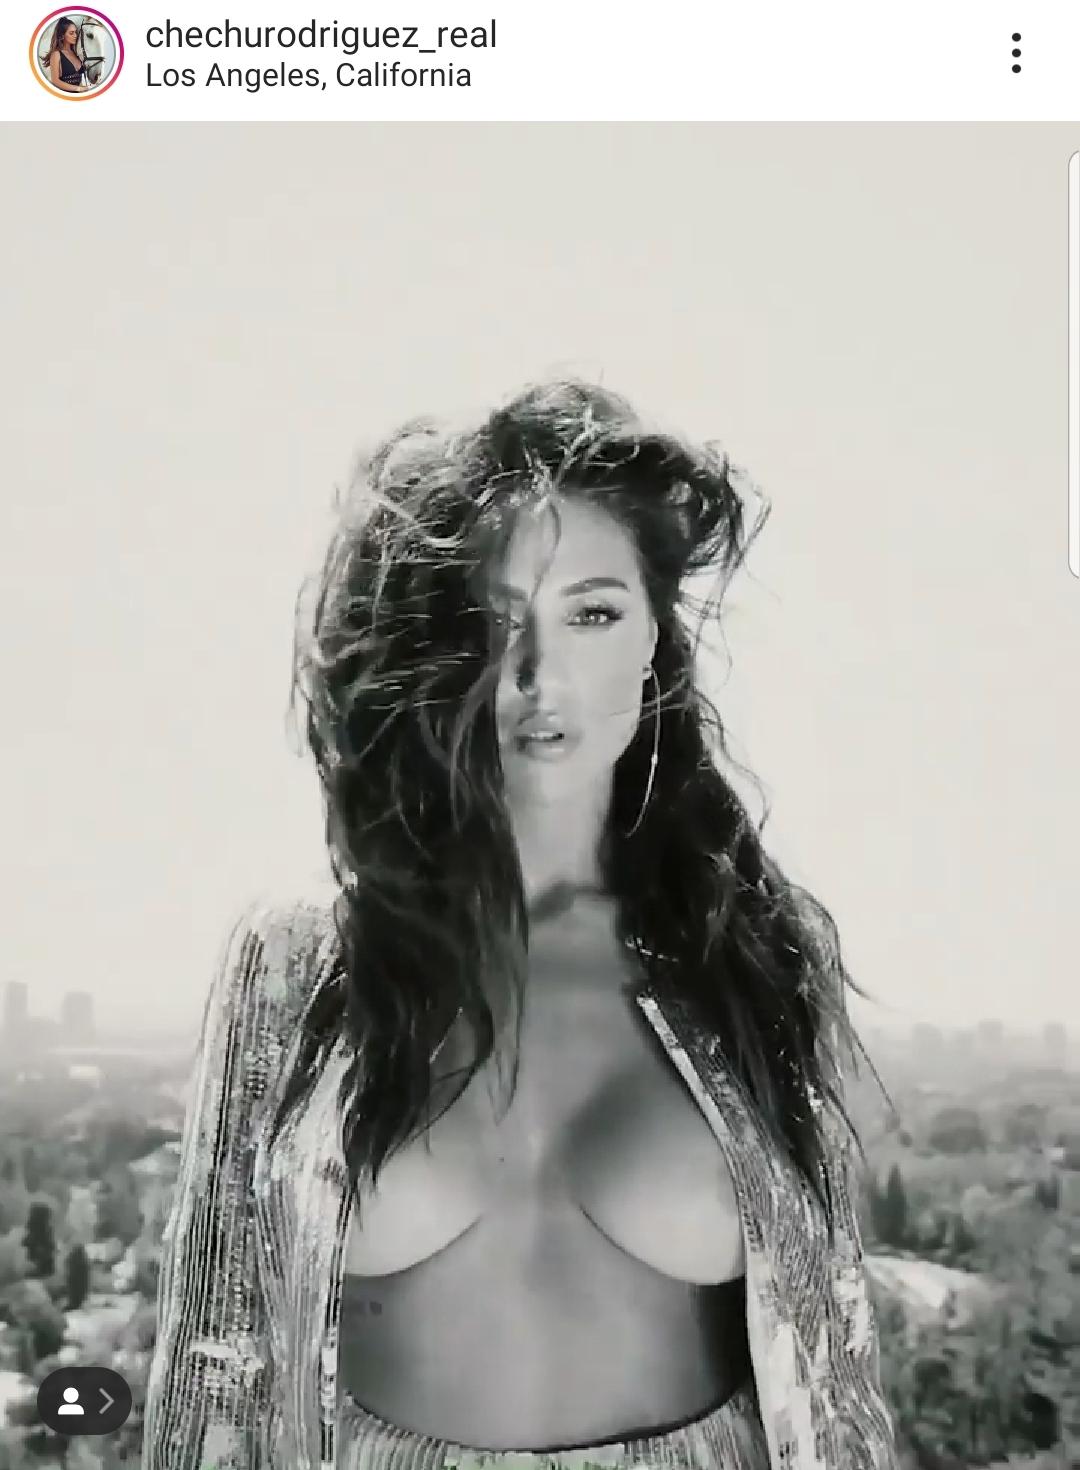 Belen Nuda Calendario.Cecilia Rodriguez Supera Belen Seno All Aria In Un Video